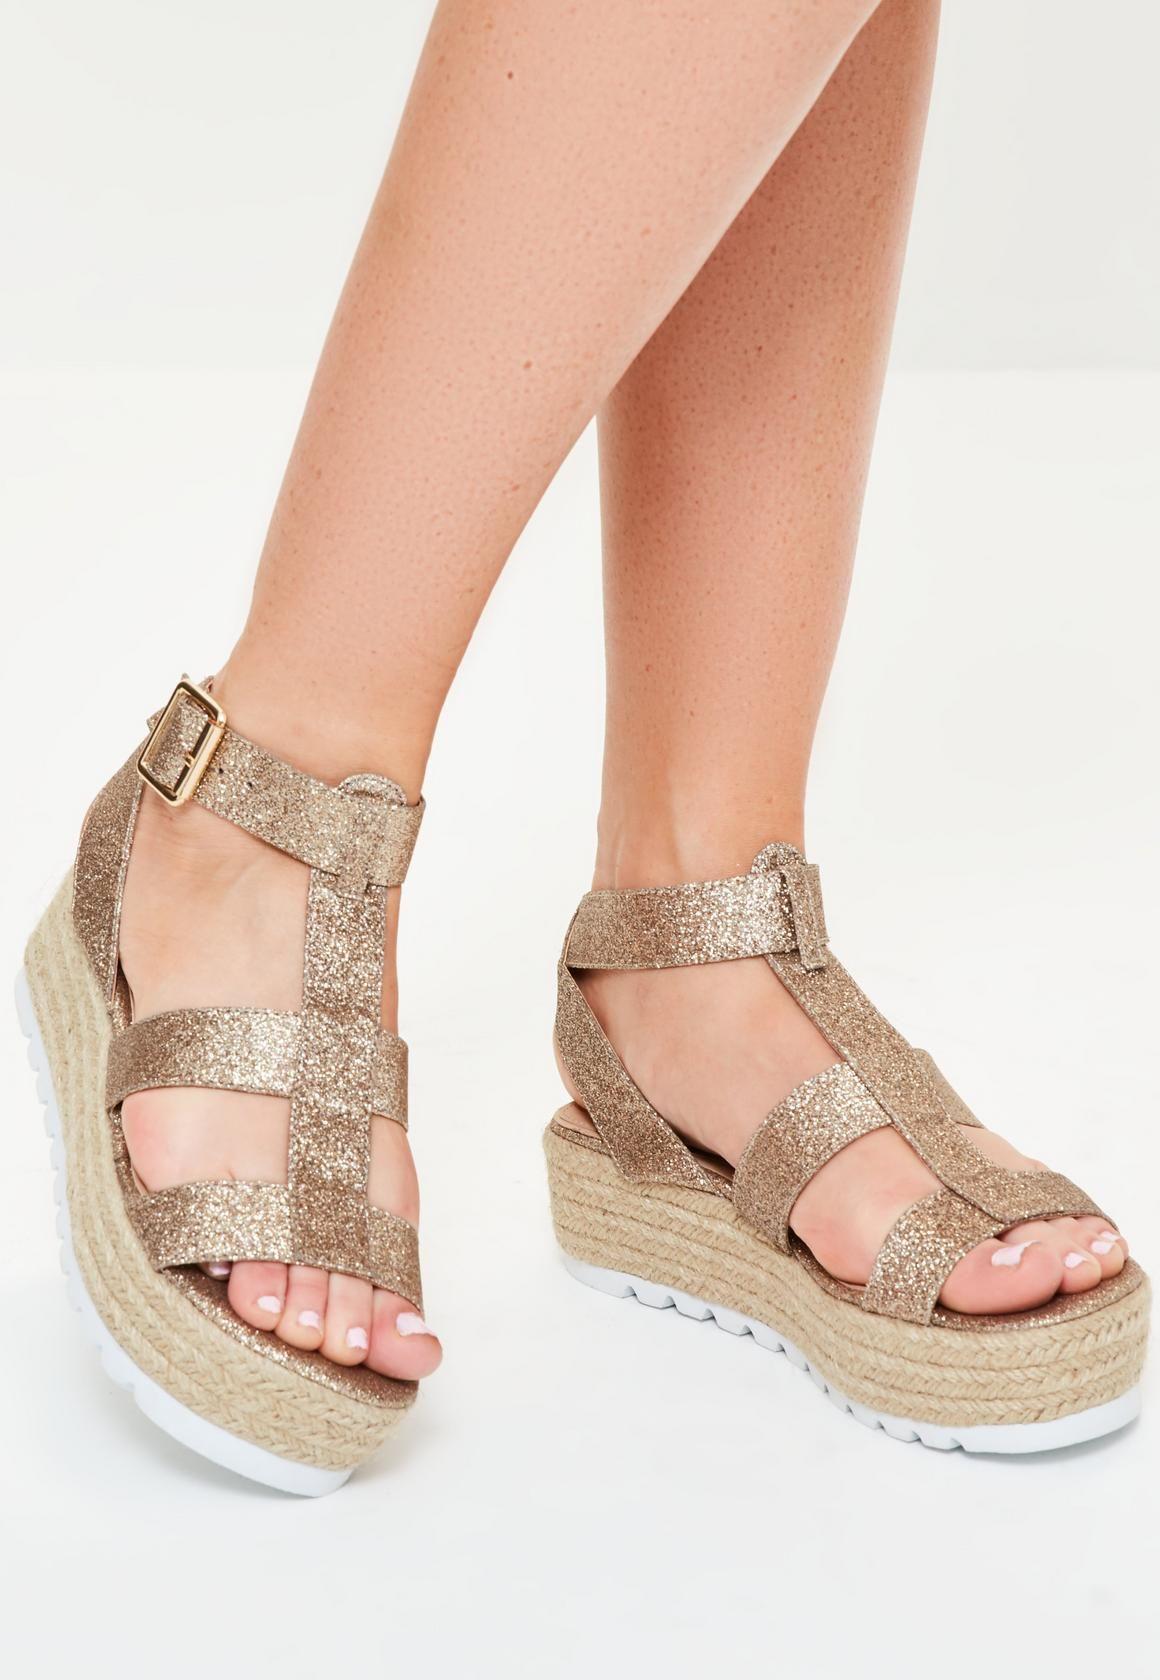 71339a3007a Missguided - Rose Gold Glitter Flatform Gladiator Sandals